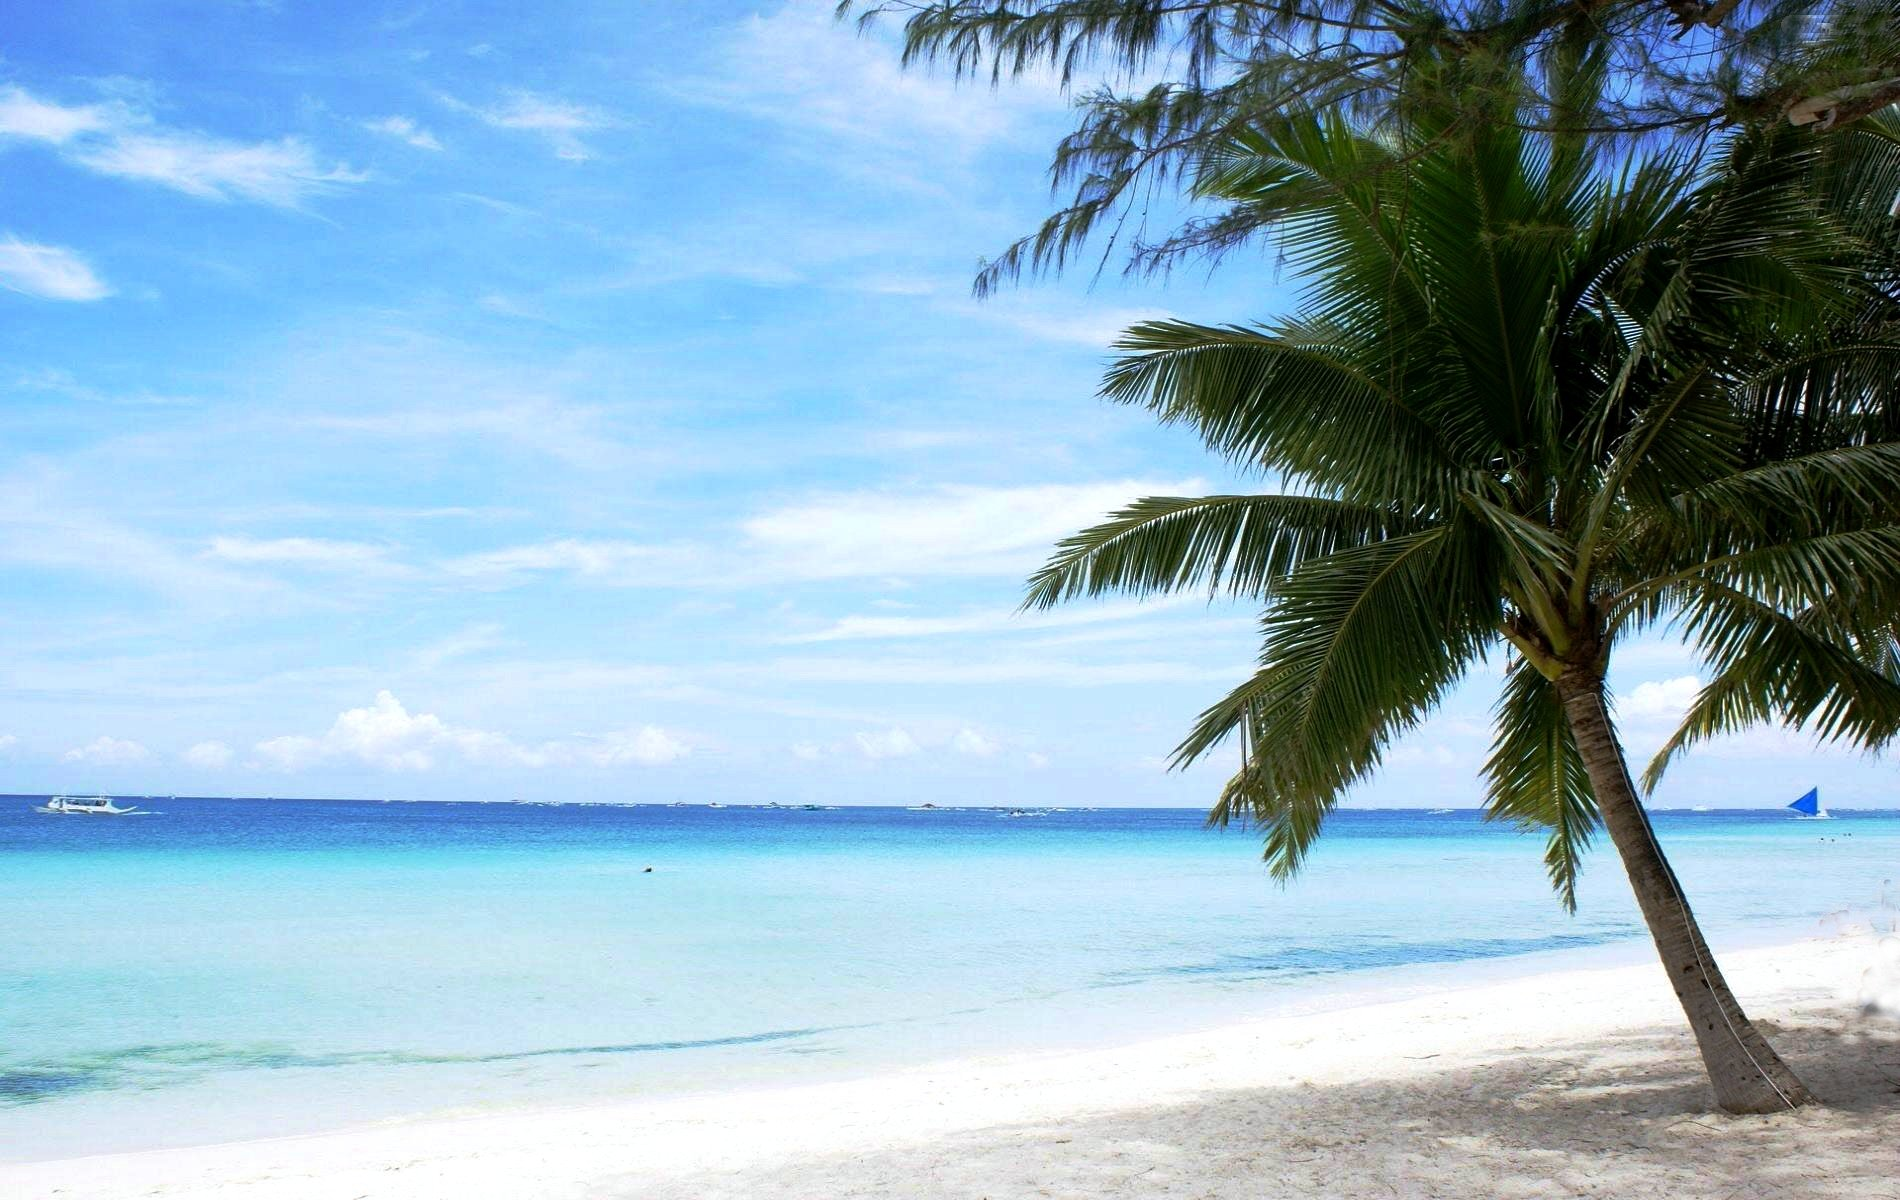 35 Desktop Backgrounds Beach Download Free Beautiful: Free Desktop Wallpaper Beach Scenes